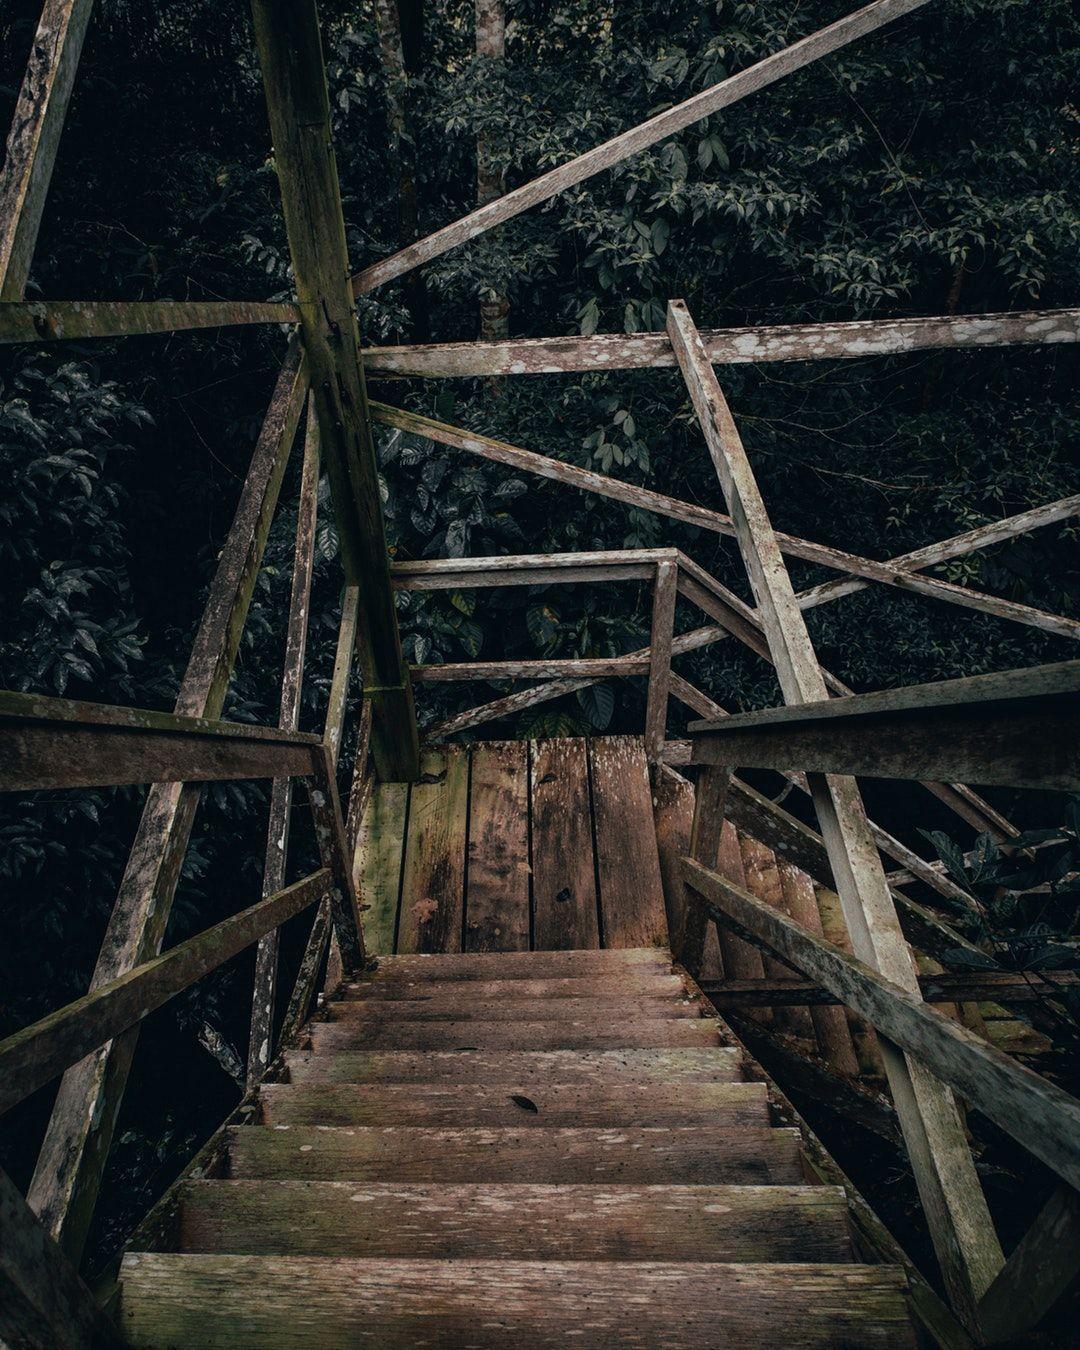 Woodworking Woodshop Woodworkingtools In 2020 Woodworking Shop Projects Diy Wooden Projects Wooden Stairs